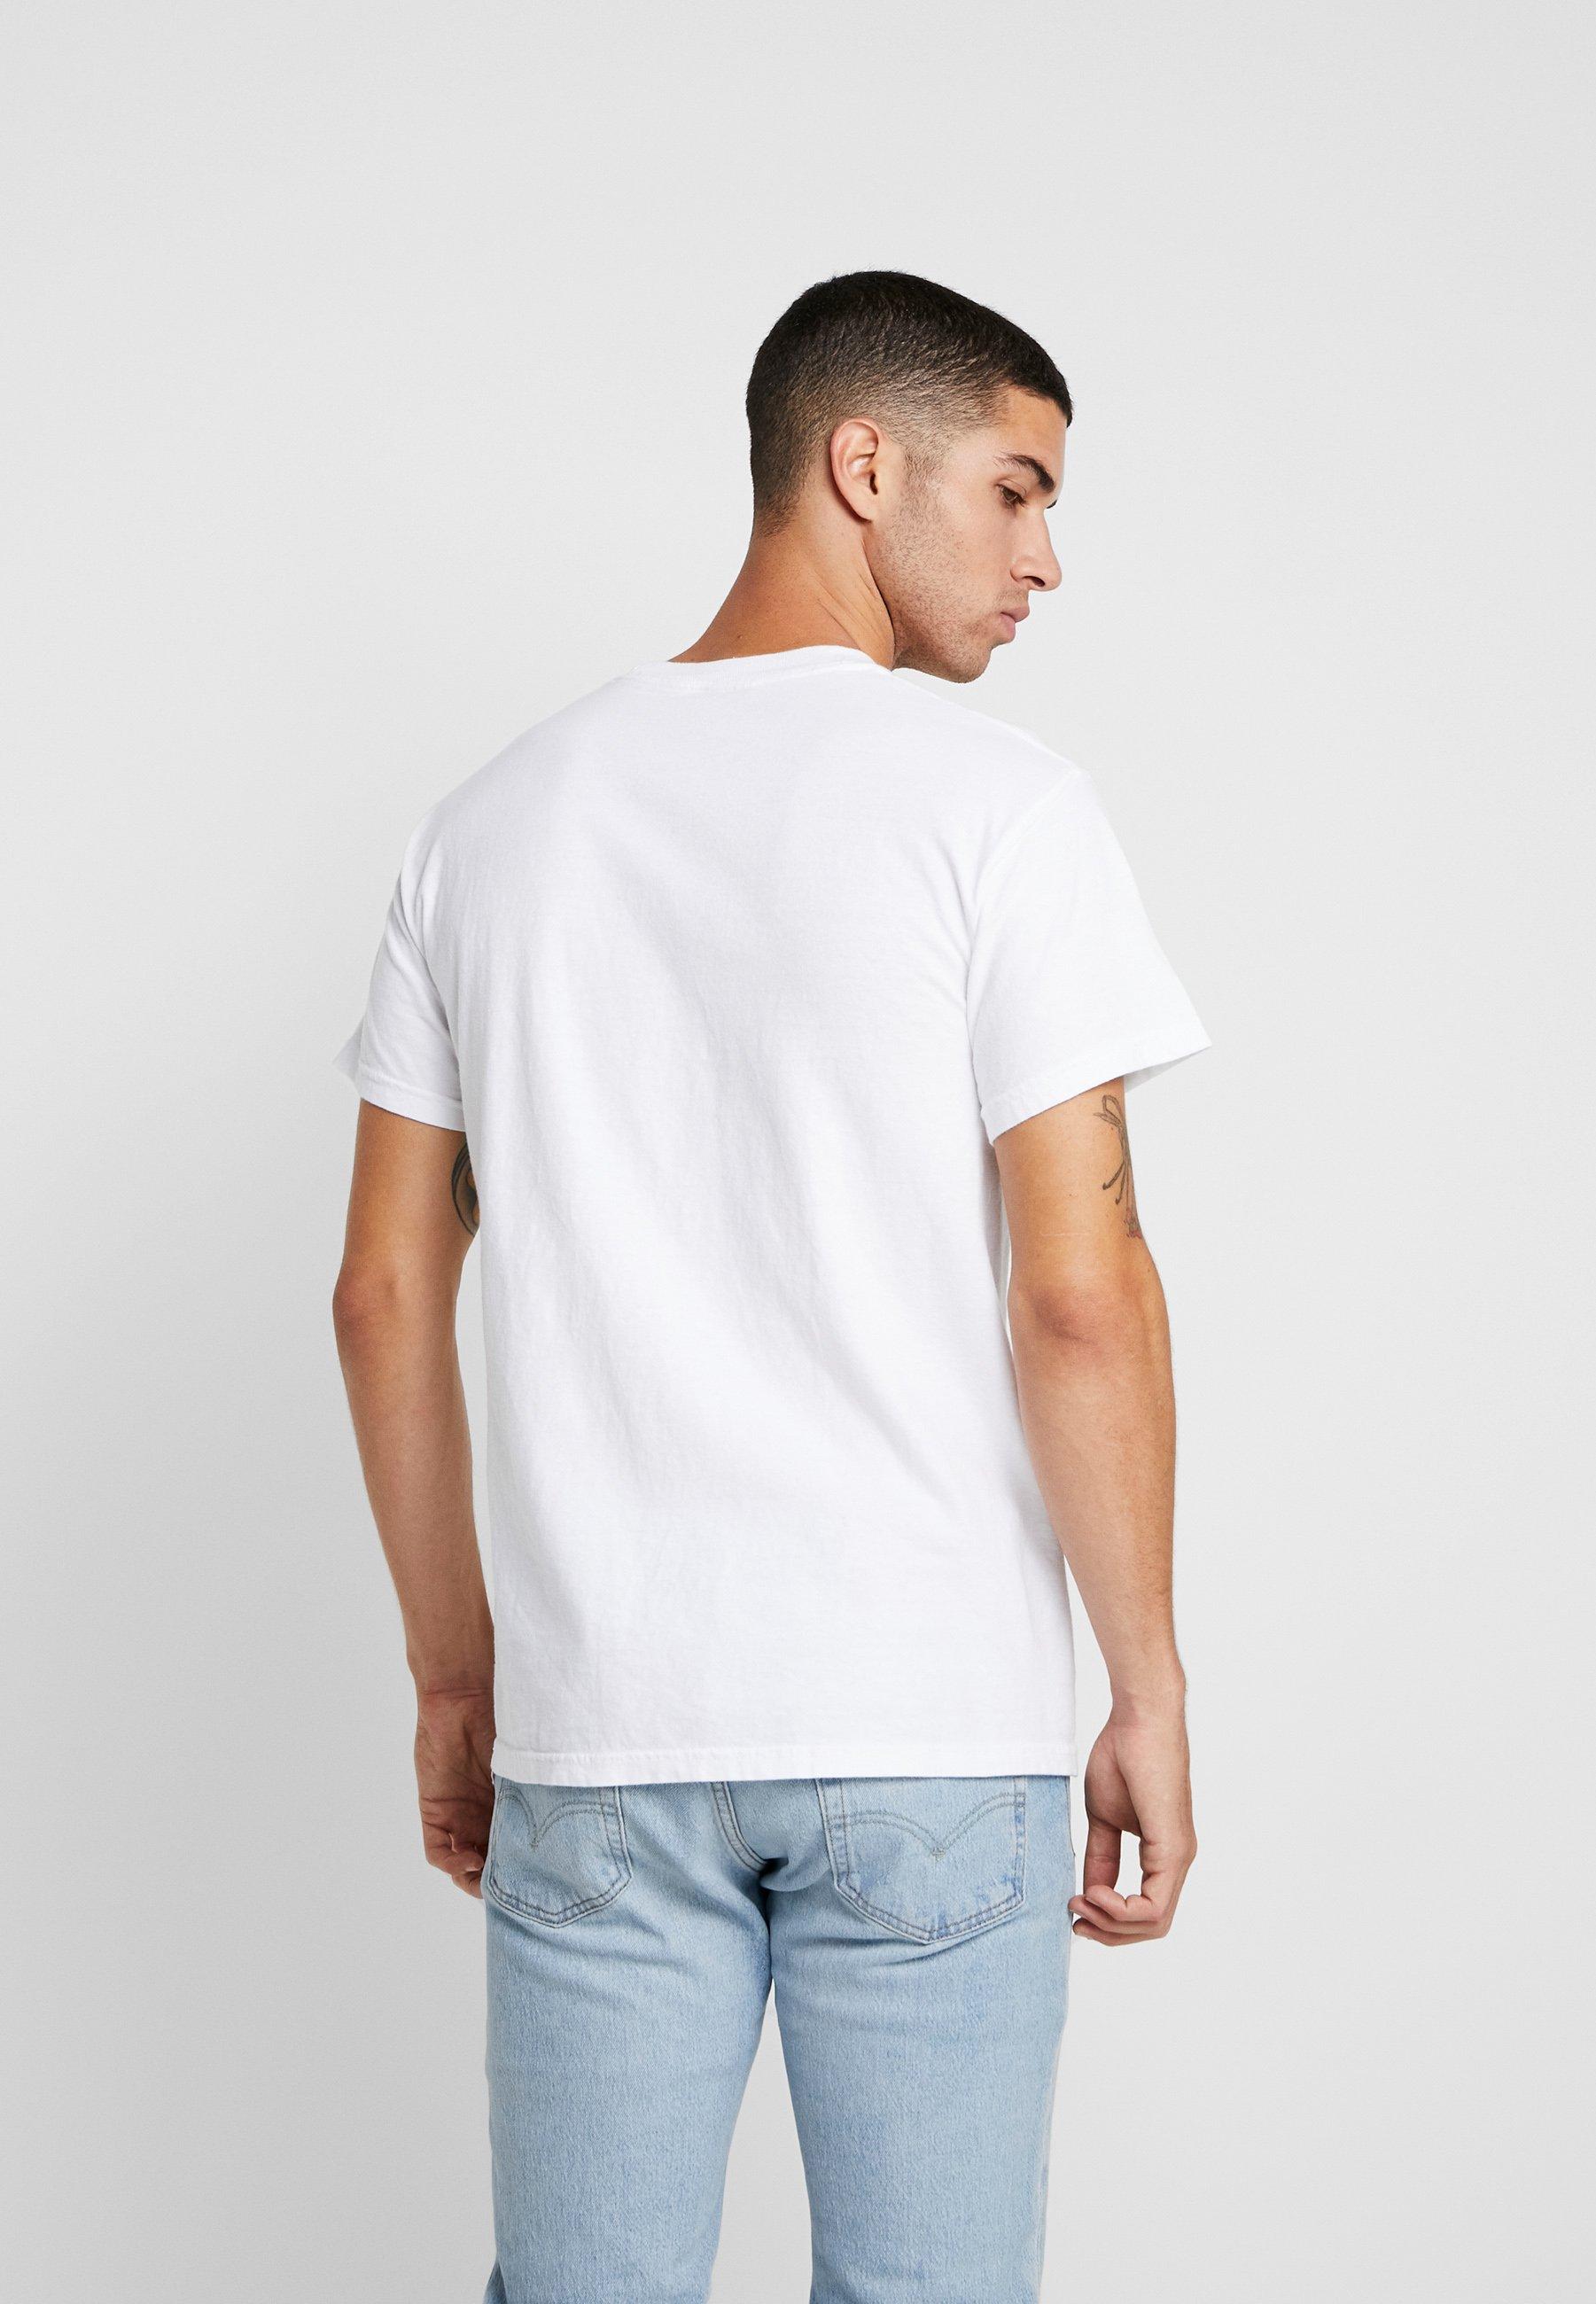 TeeT shirt Heart Imprimé Supply Boy CoAstro Diamond White 8OnkP0wX